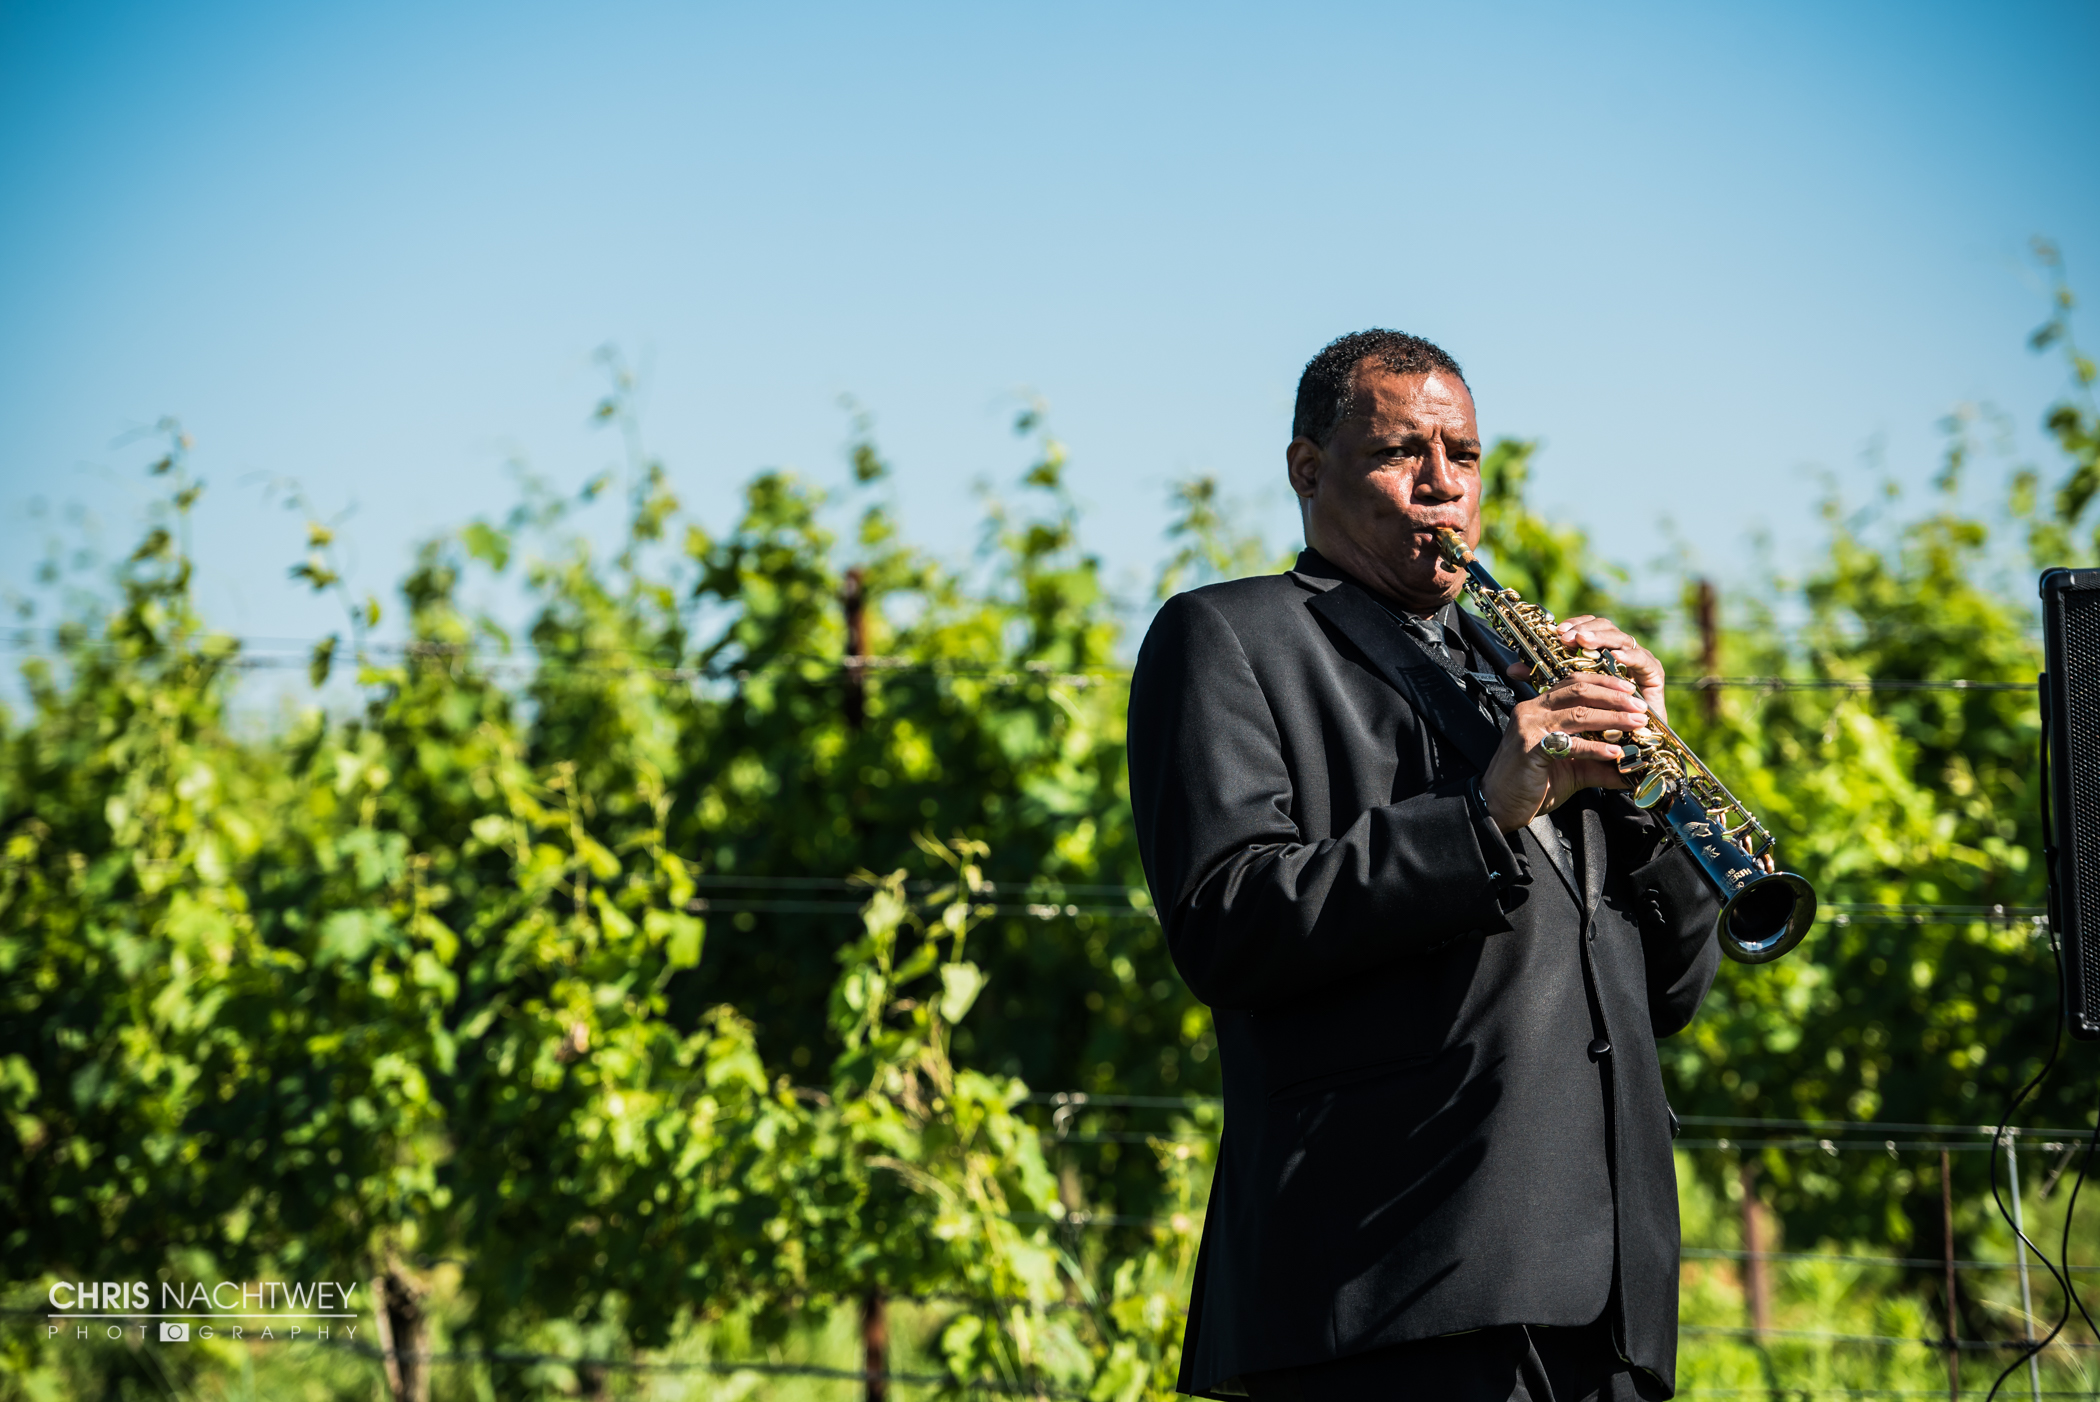 saltwater-farm-vineyard-wedding-photos-lindsay-gabe-chris-nachtwey-photography-2017-31.jpg